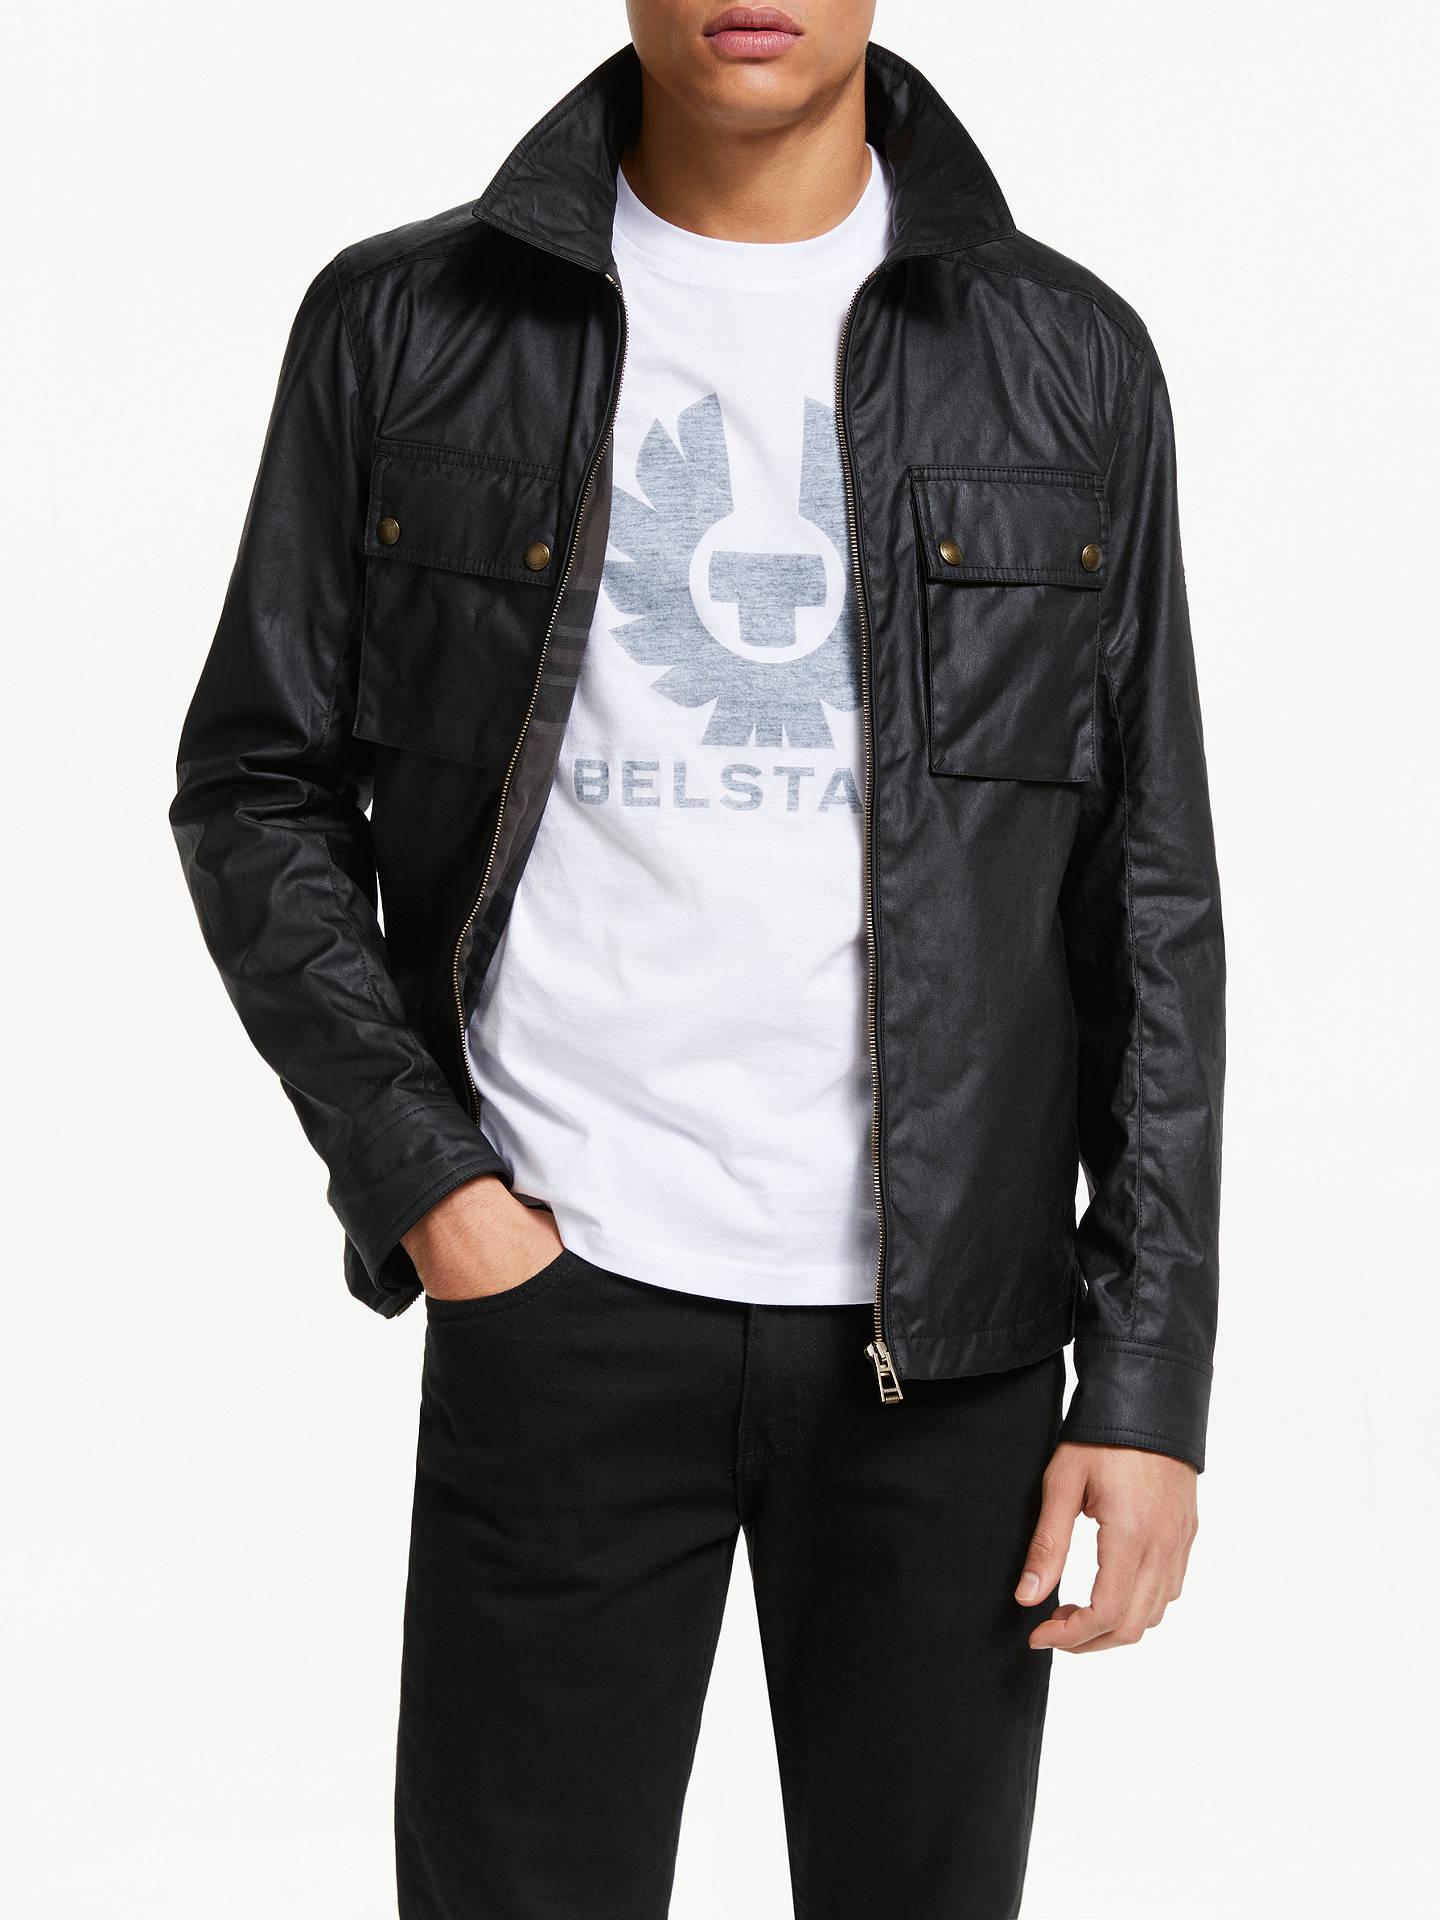 967c23f0dd1 Buy Belstaff Dunstall Jacket, Black, XL Online at johnlewis.com ...